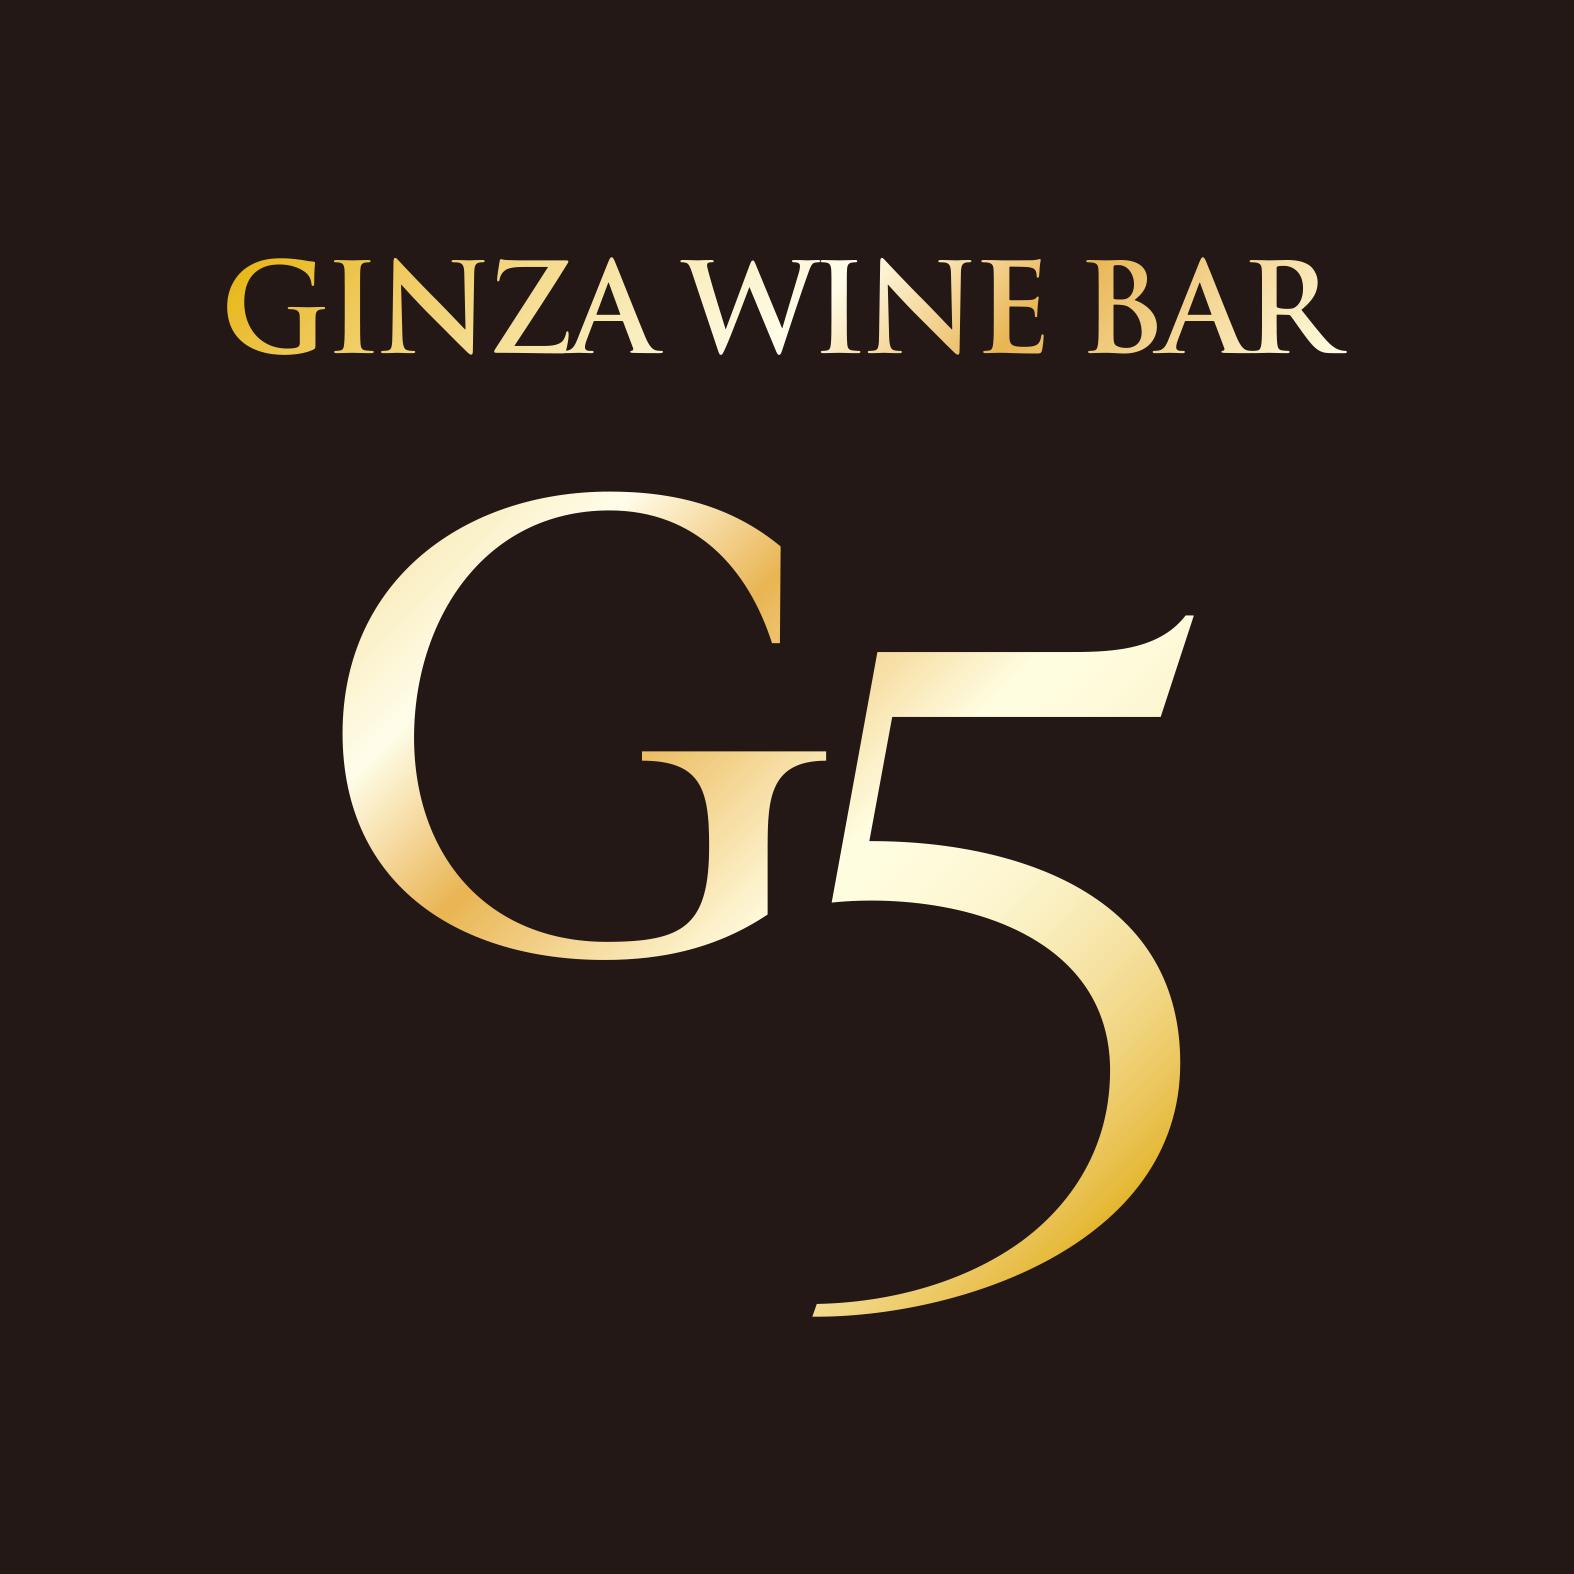 GinzaWineBar G5